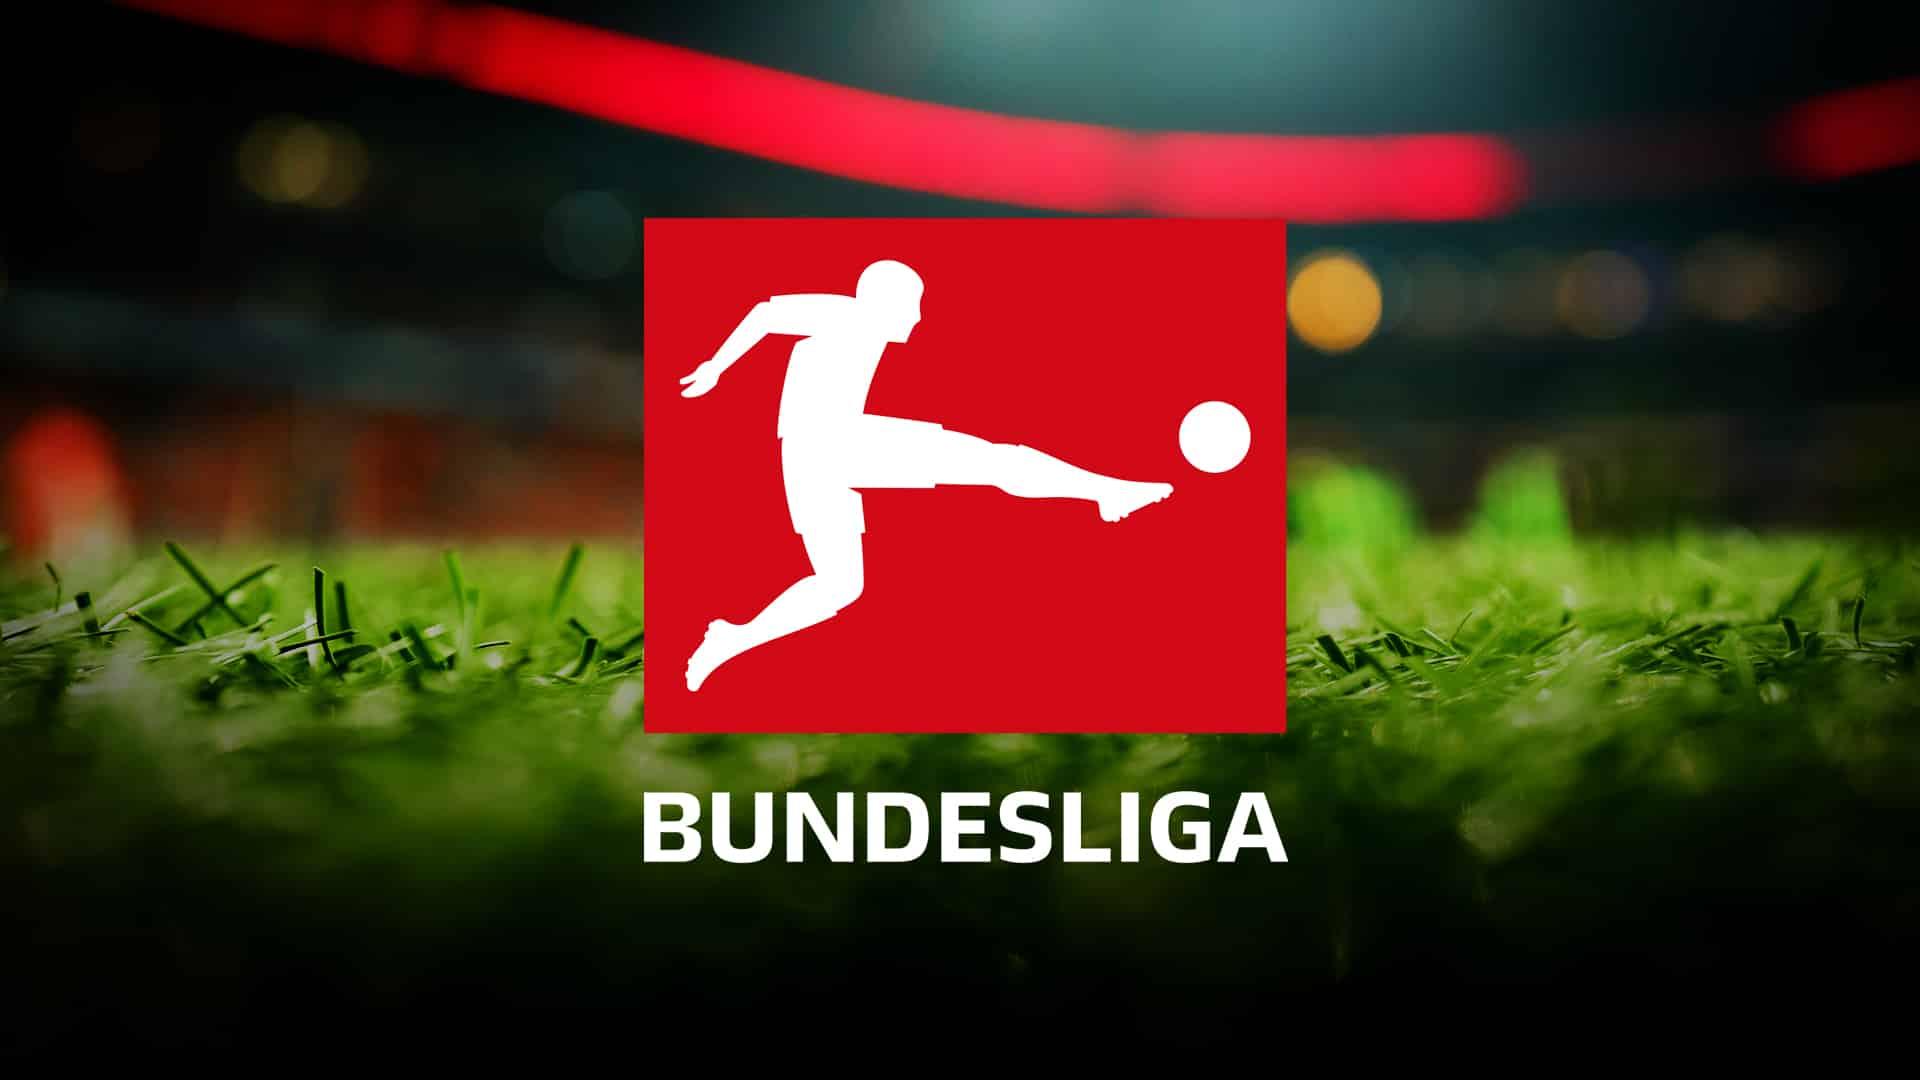 18/04/2021 Daily Predictions: Bundesliga – Borussia Dortmund vs Werder Bremen